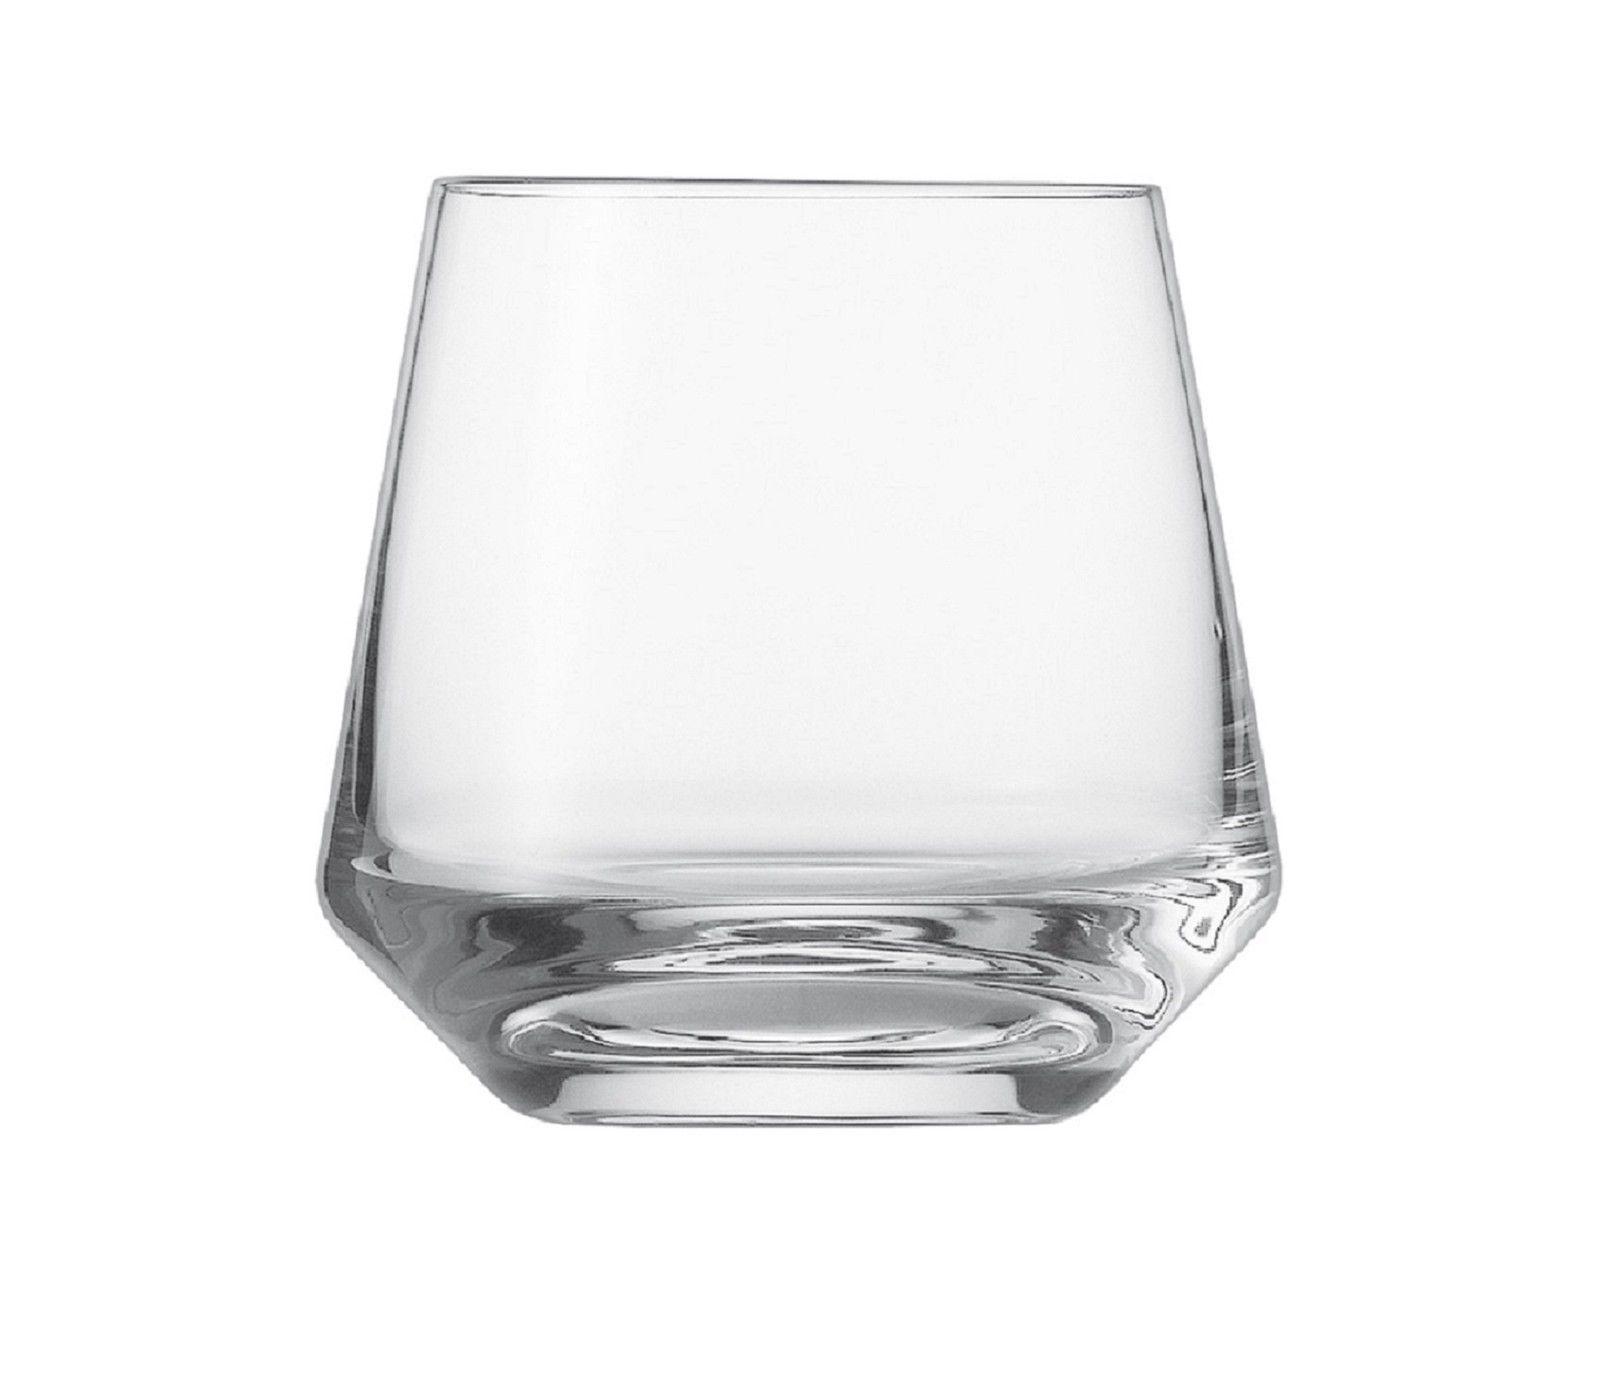 Онлайн каталог PROMENU: Набор стаканов для виски Schott Zwiesel Pure, объем 306 мл, 6 шт.                               112844_6шт